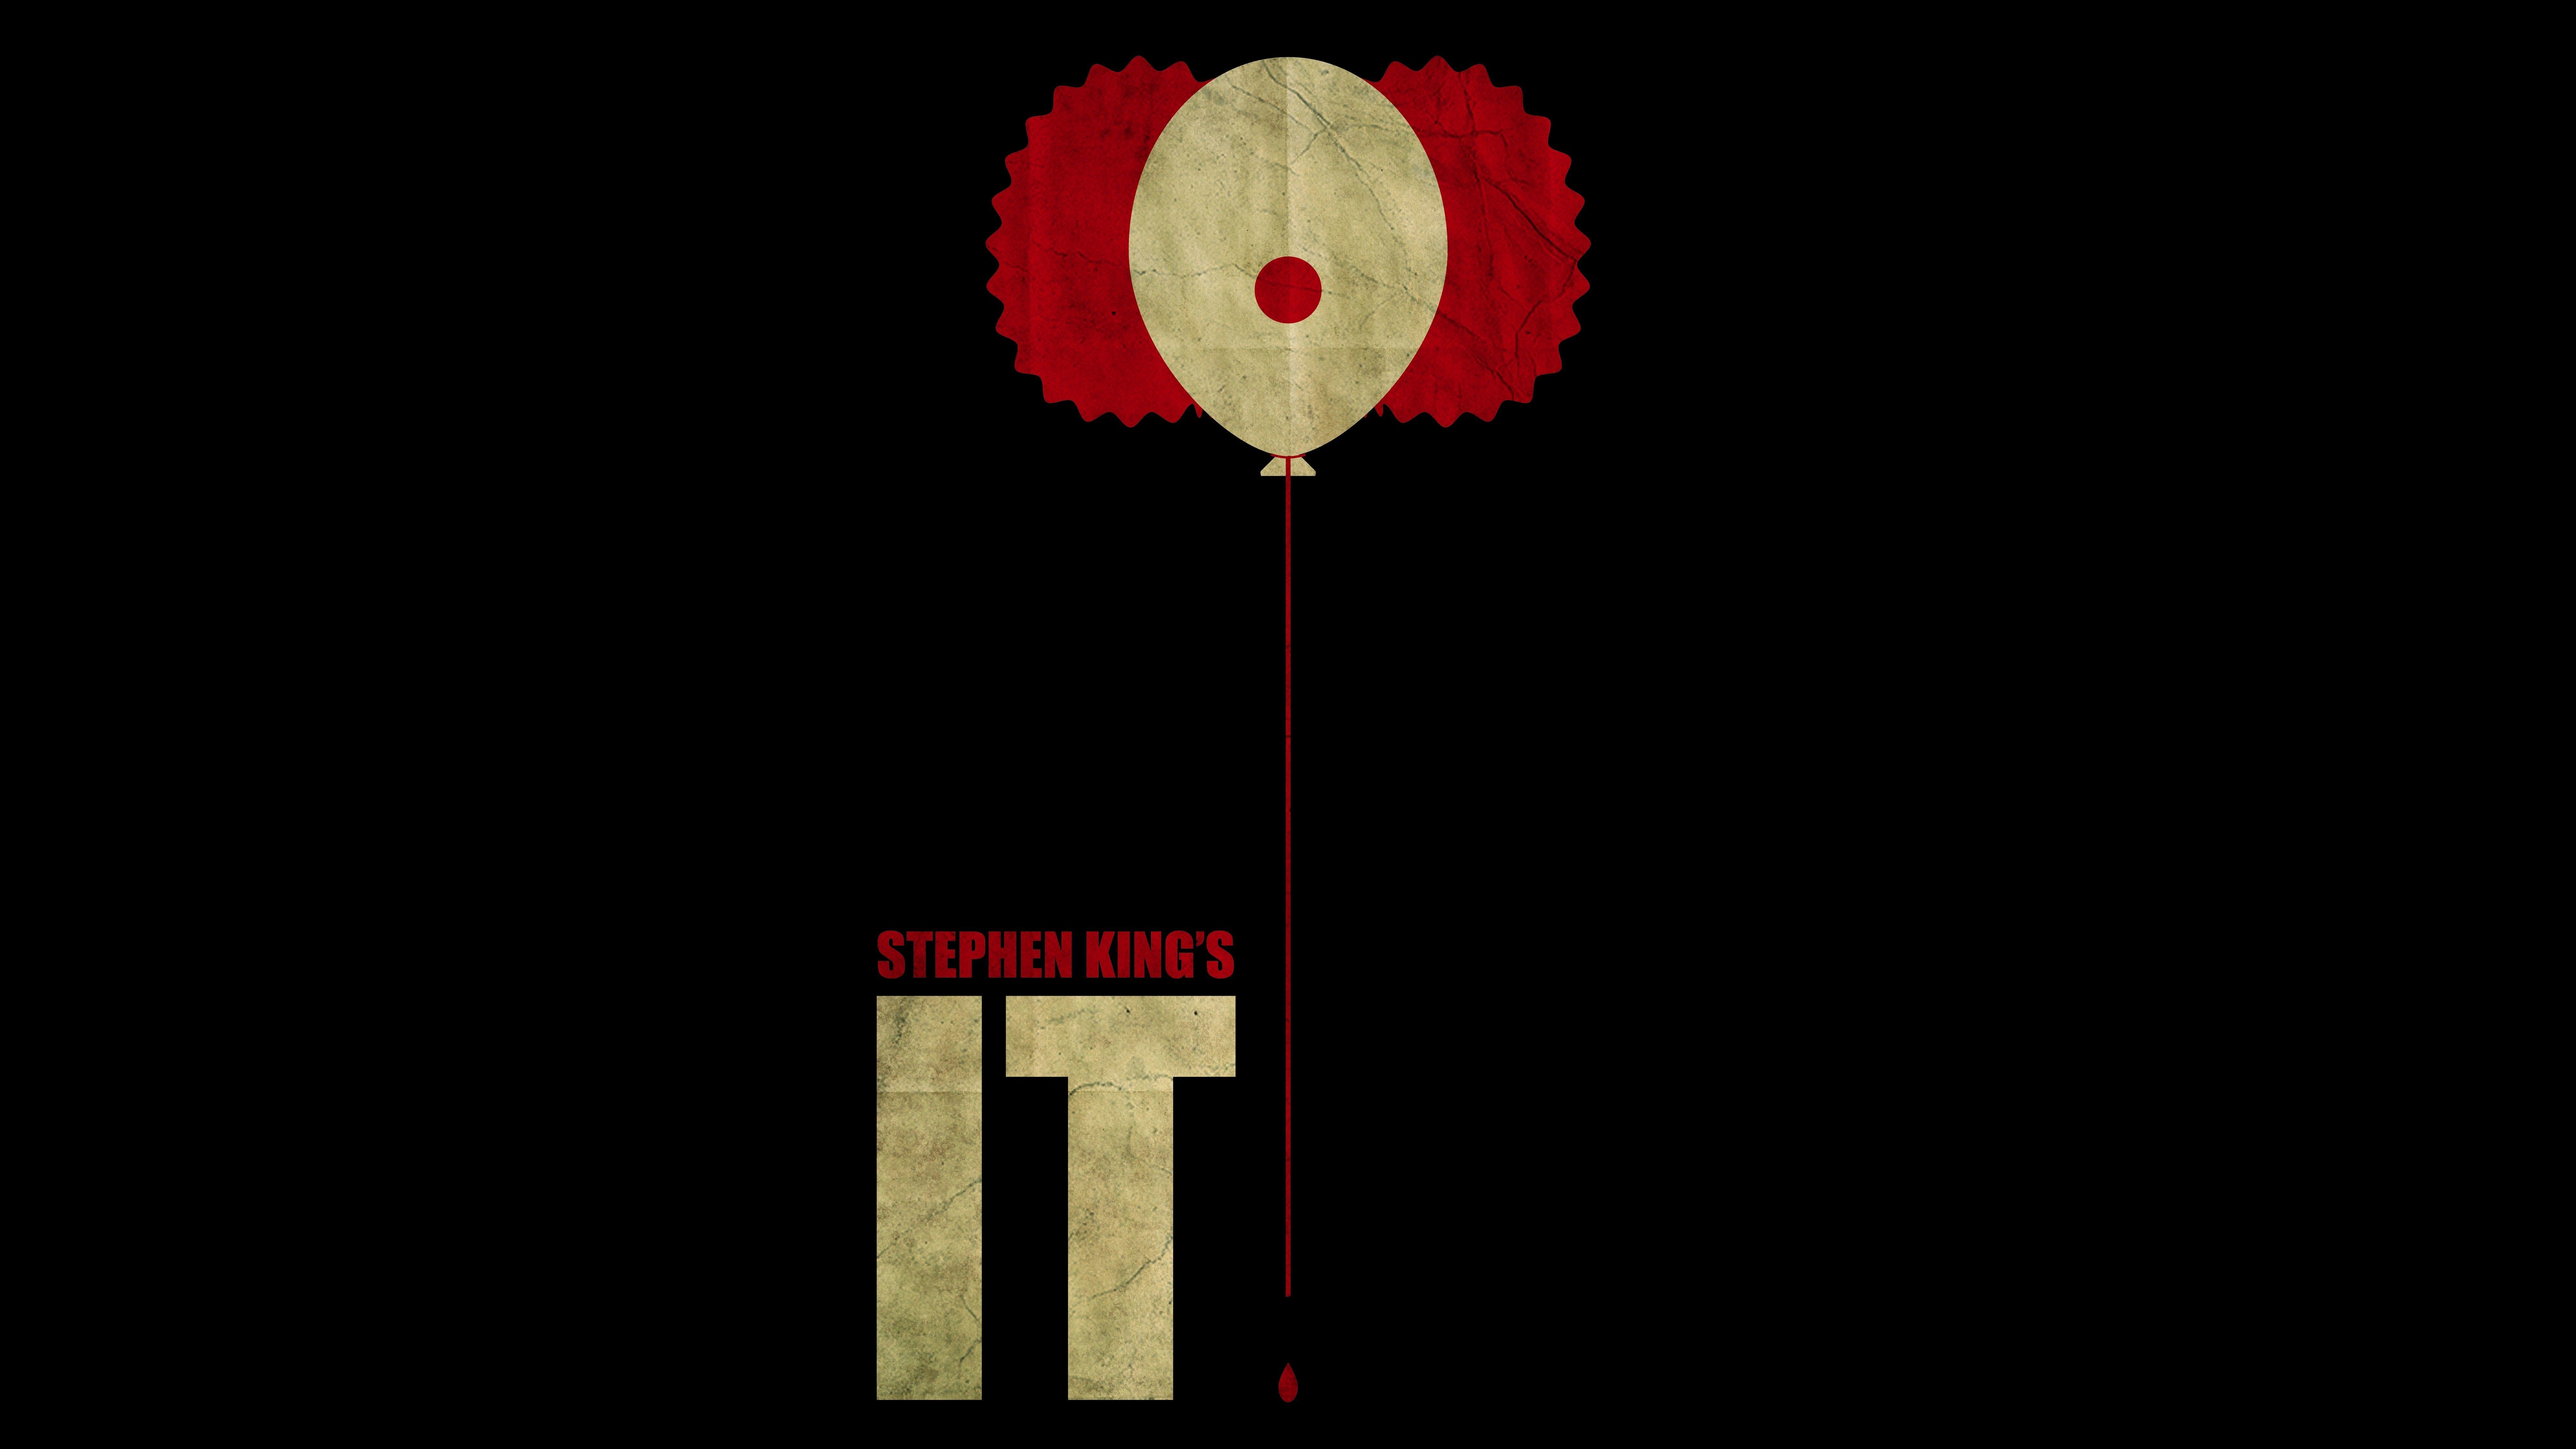 artwork, Movies, It (movie), Stephen King, Clowns, Minimalism